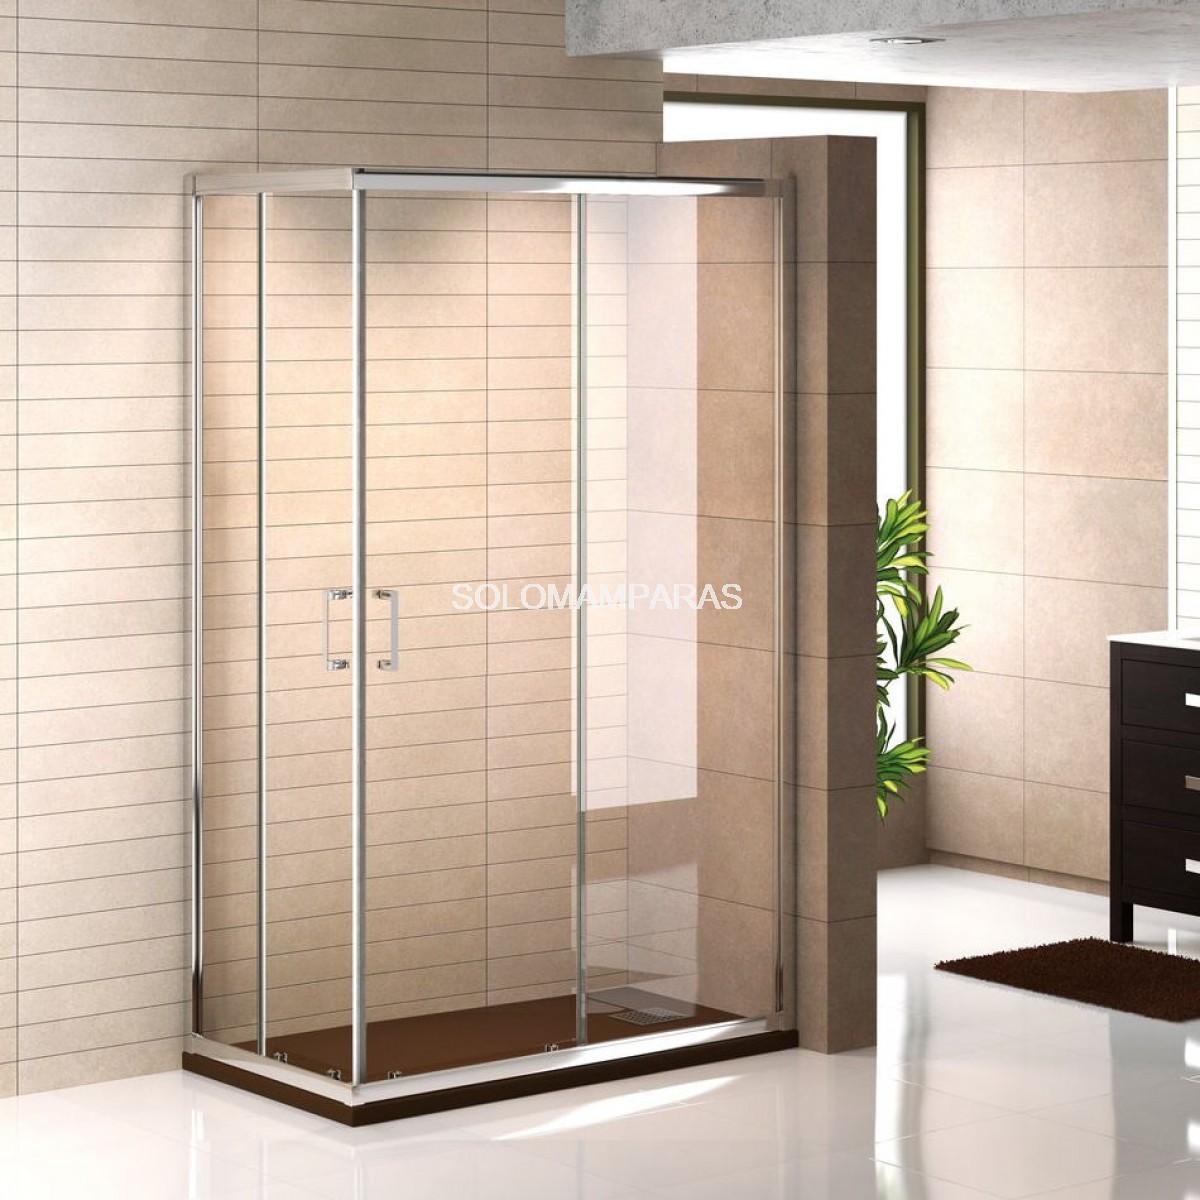 Mampara ducha cromo niza angular 2fijas 2correderas - Mamparas de ducha fijas ...